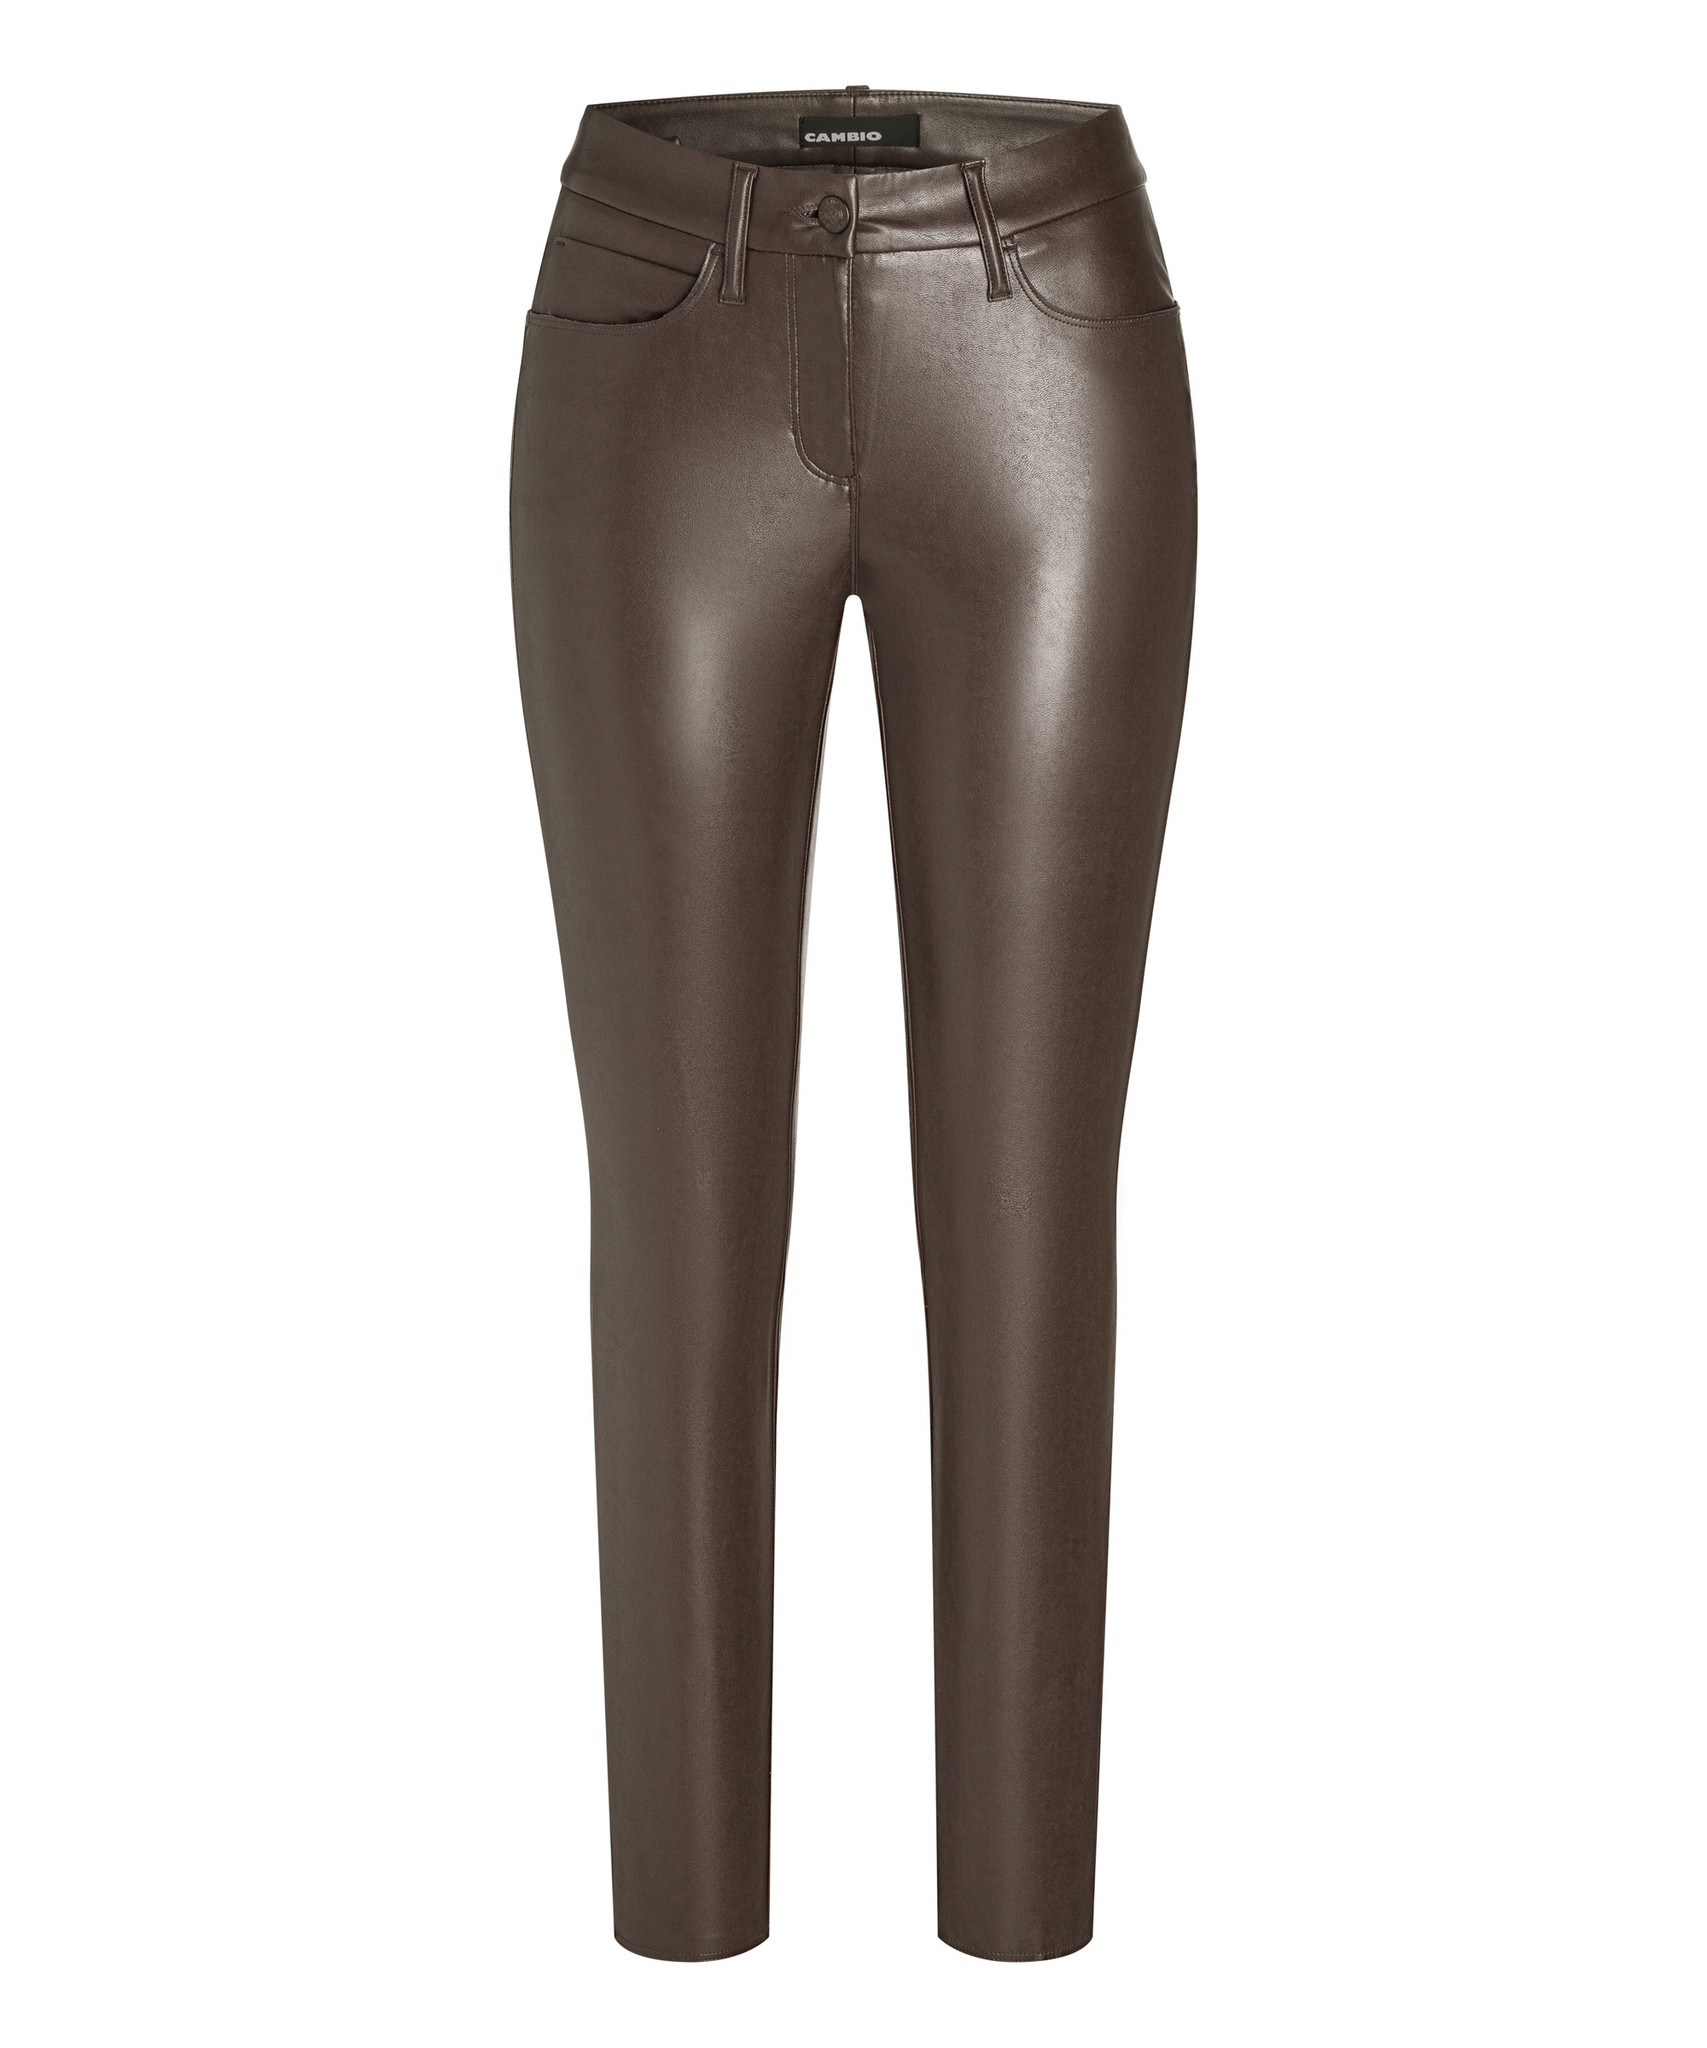 Cambio Nappa leatherpants RAY 6301-1